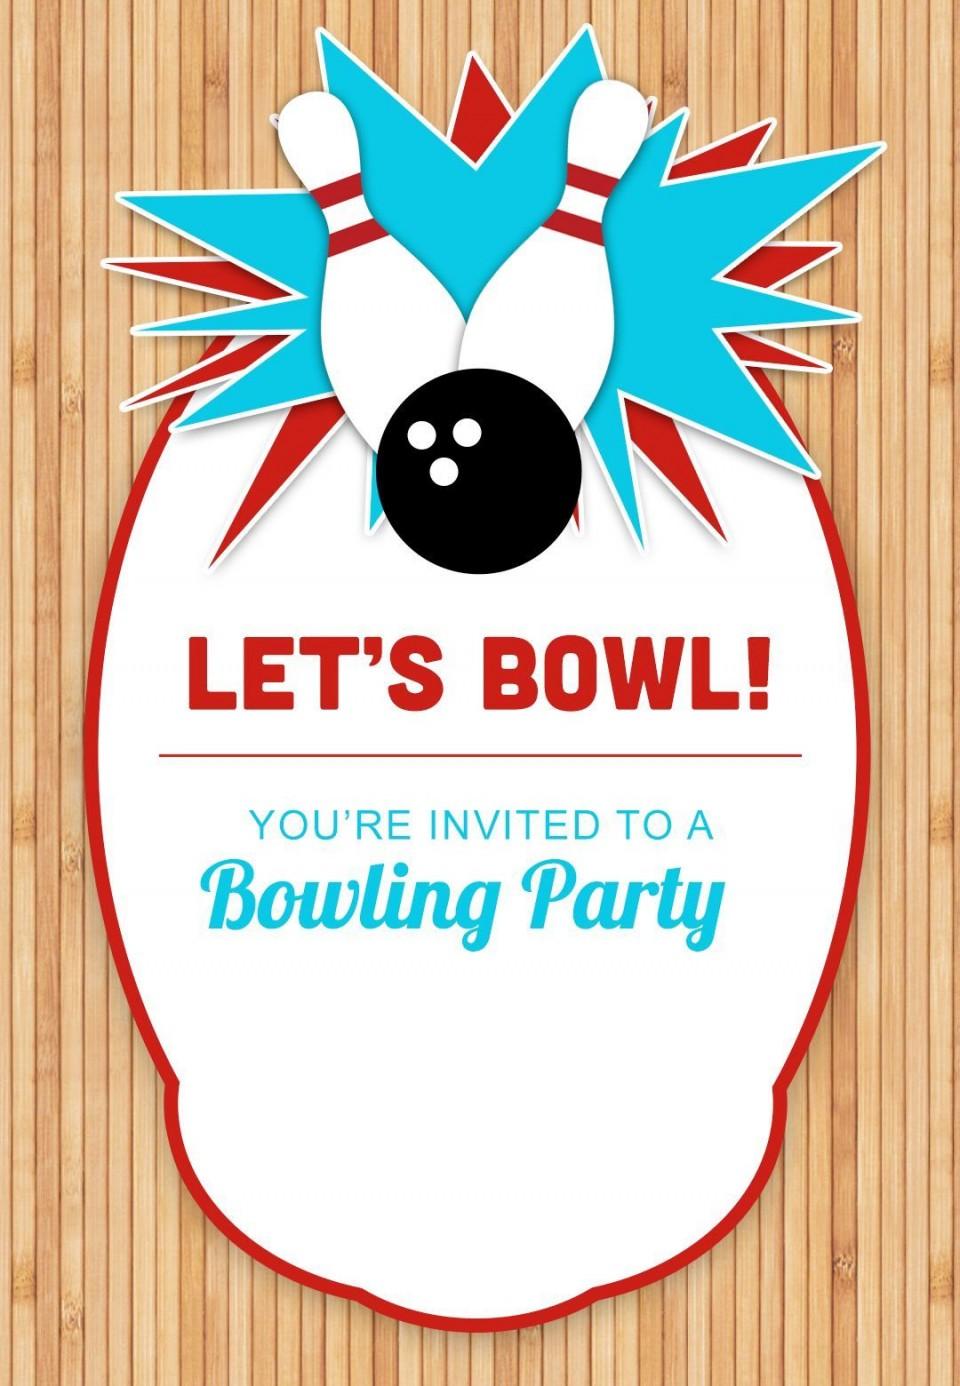 003 Marvelou Bowling Party Invite Printable Free Sample  Birthday Invitation960